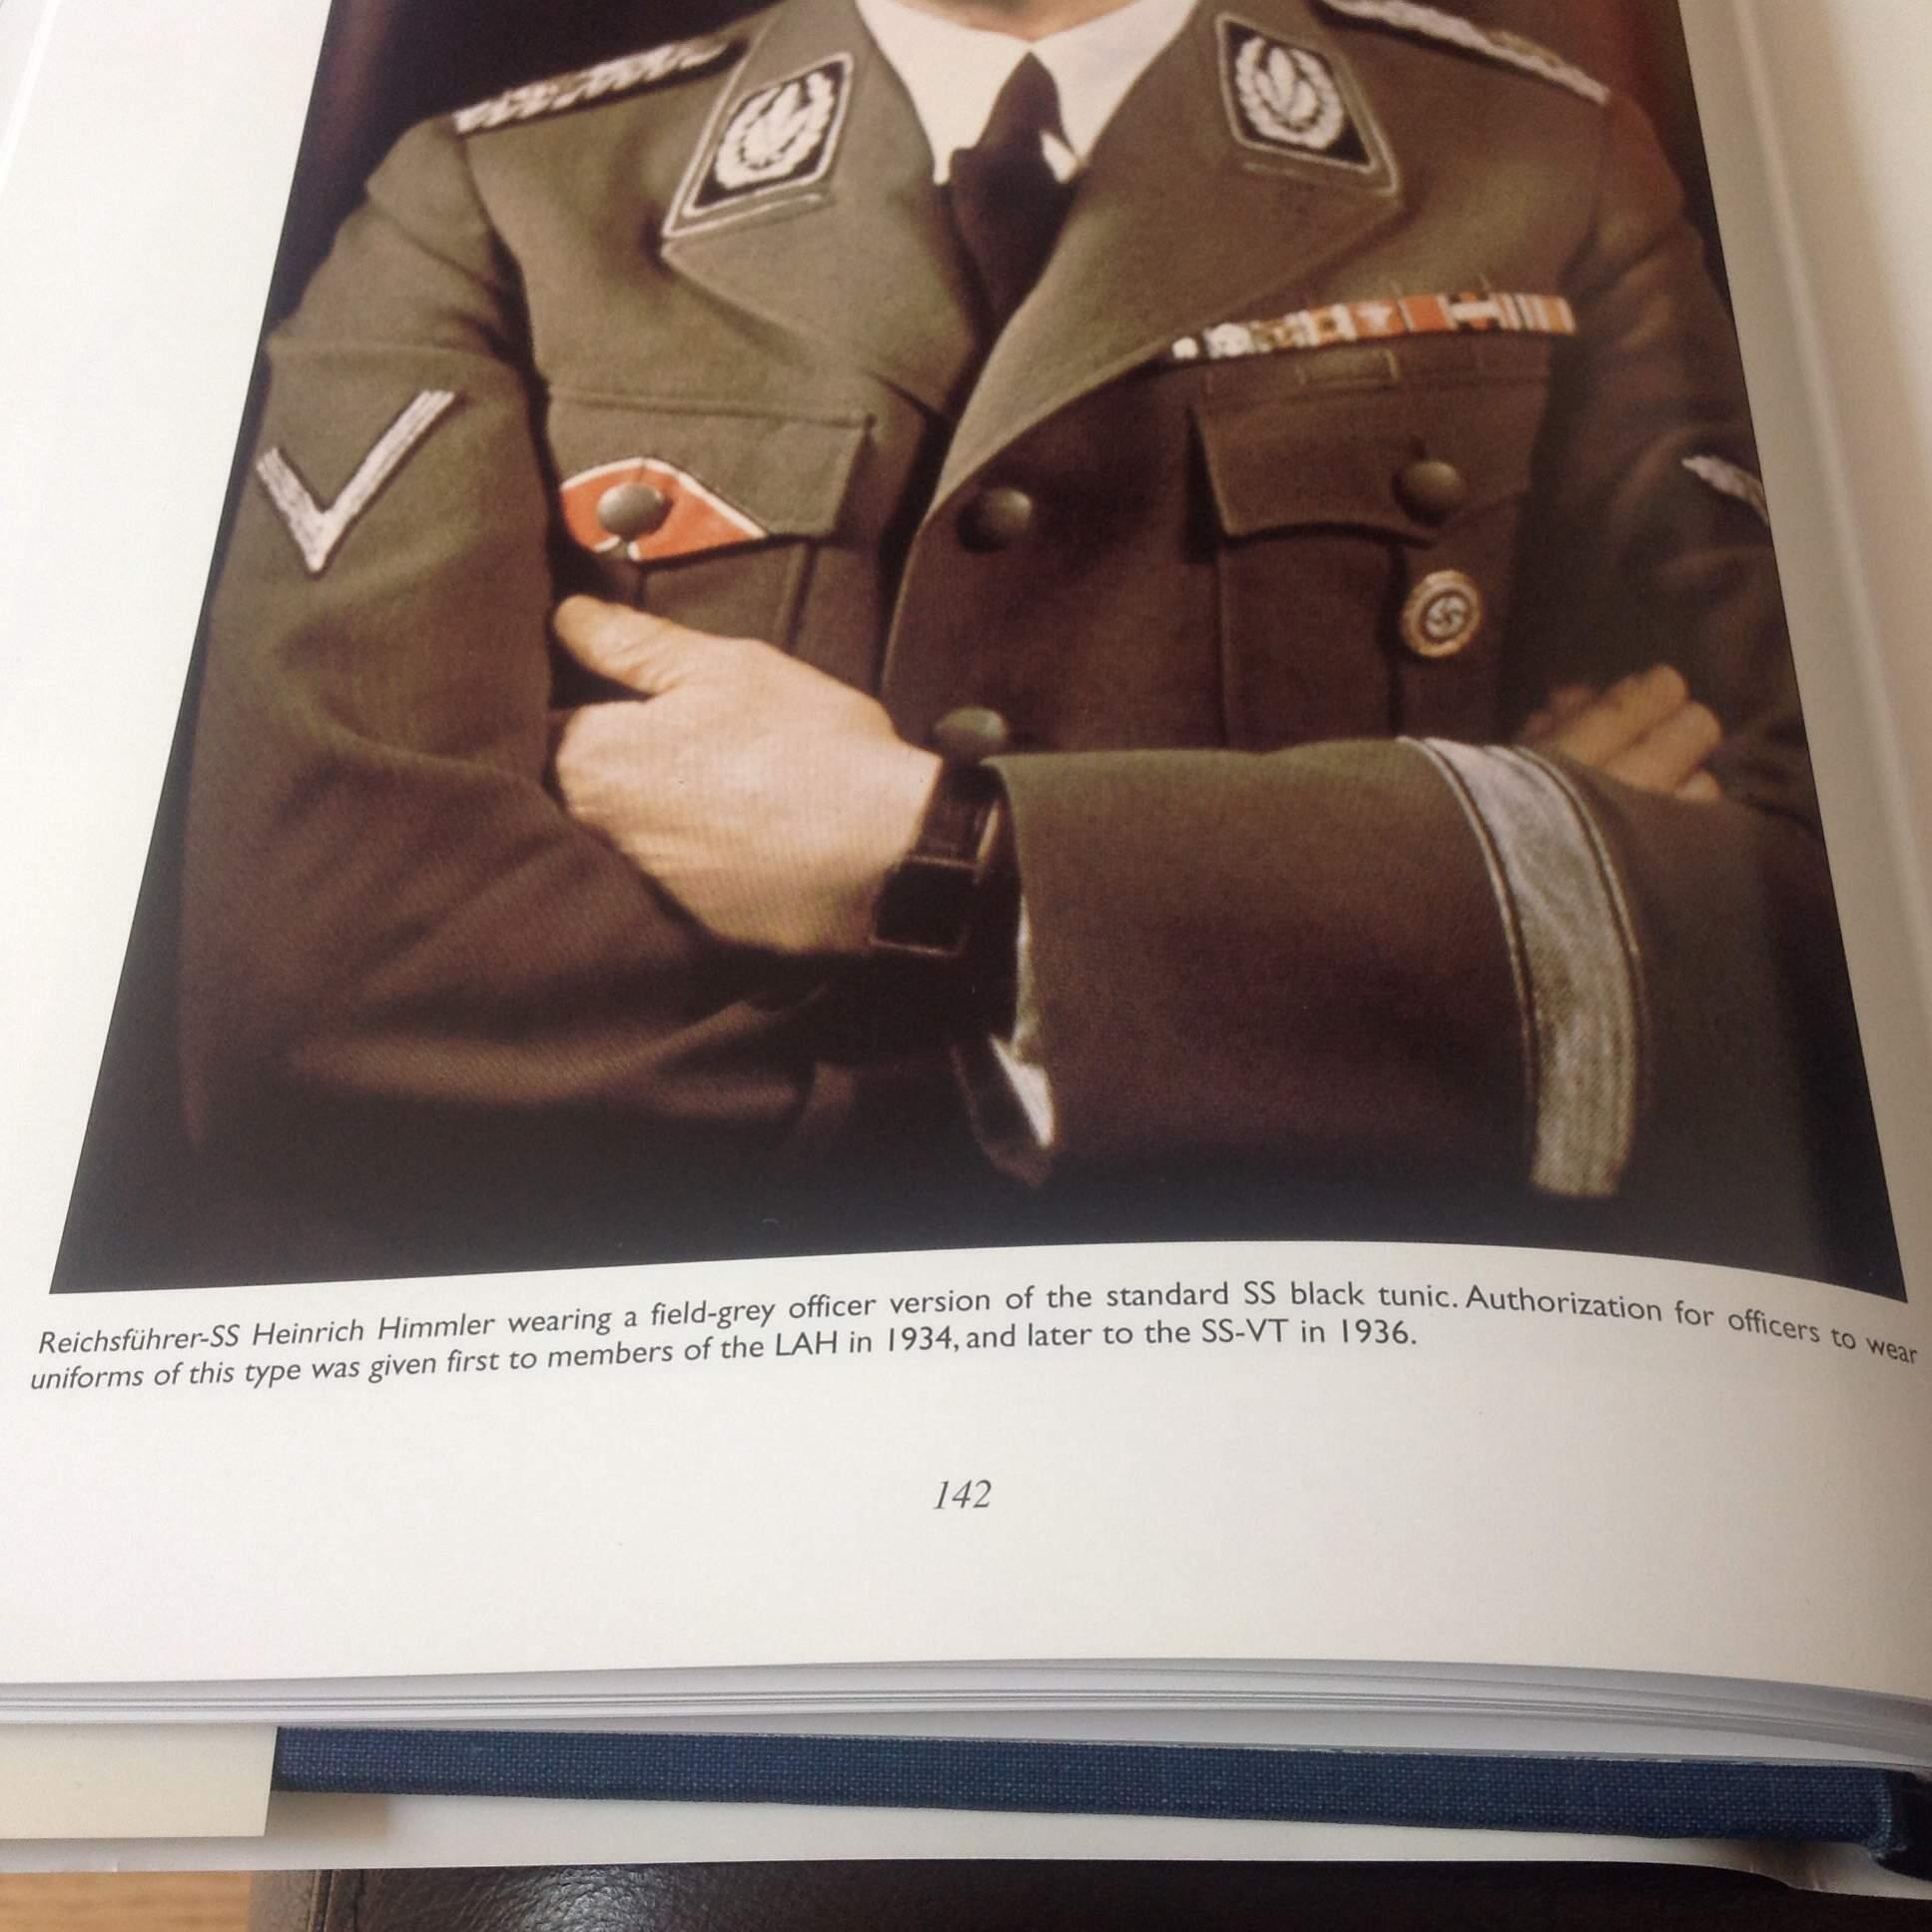 Question Allgemeine SS Uniforms With 2 Shoulder Boards